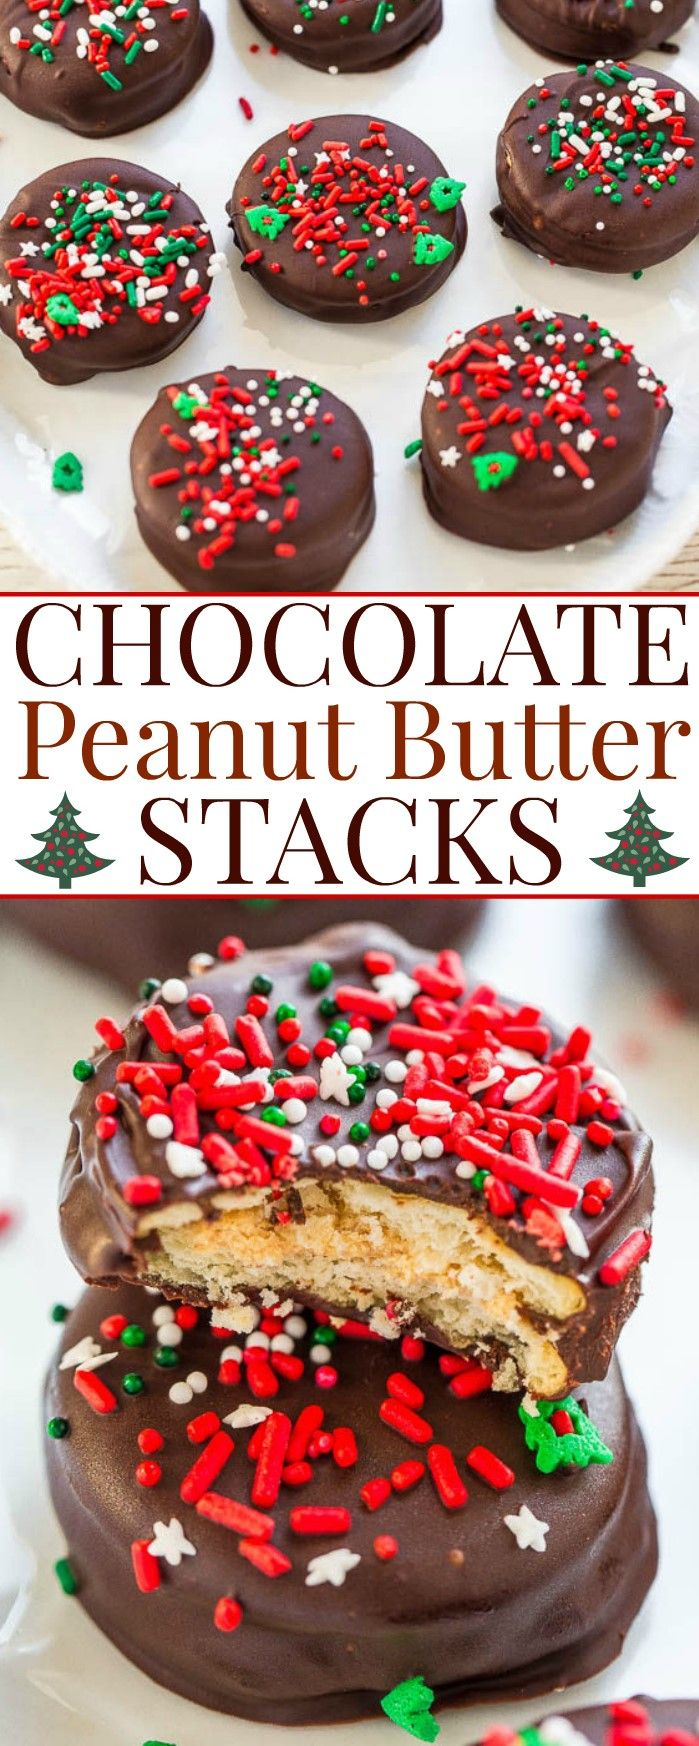 Chocolate Peanut Butter Stacks